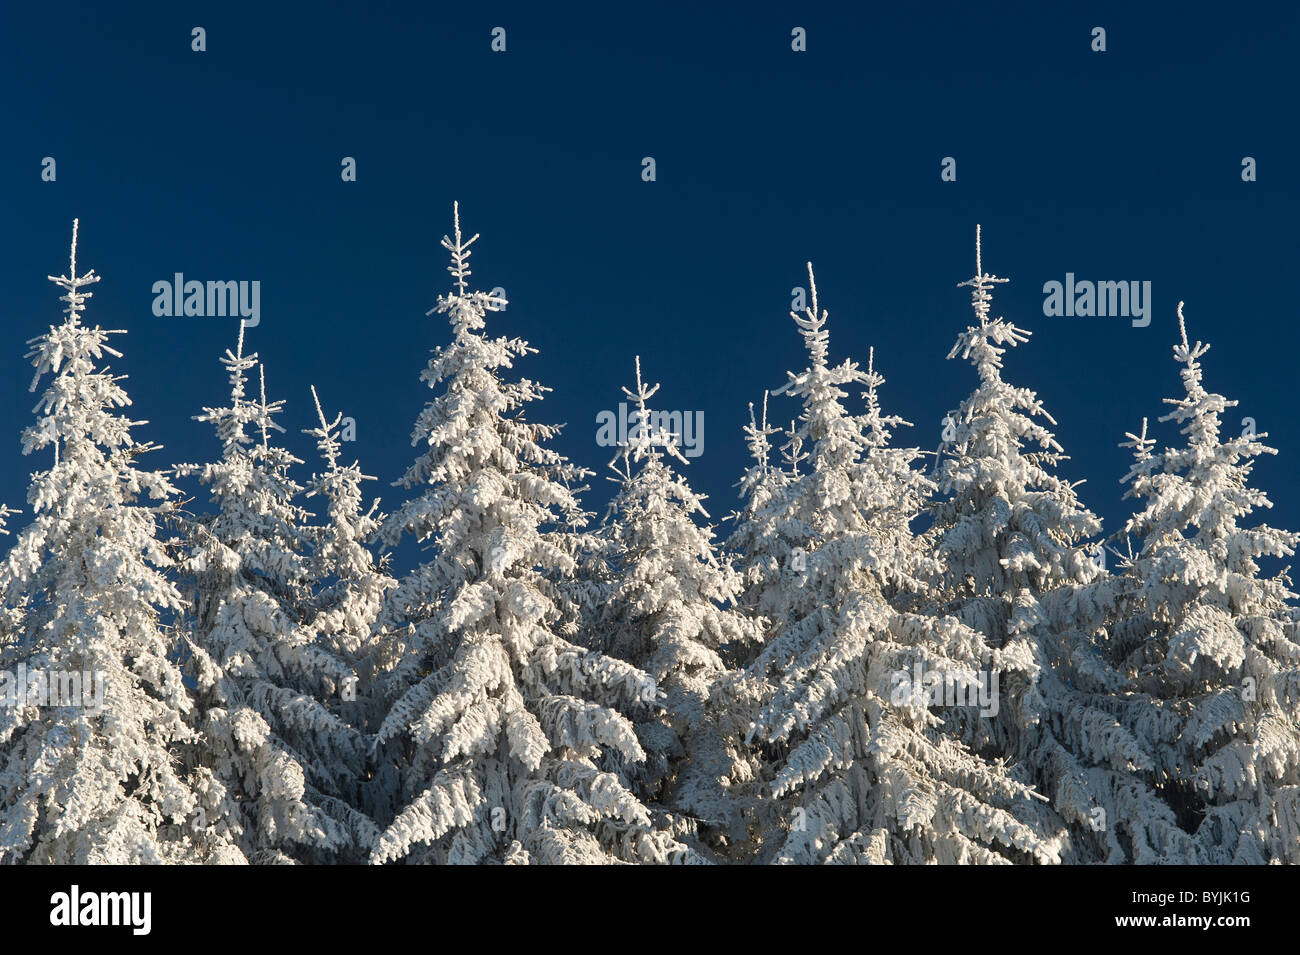 Snow on  fir trees France - Stock Image